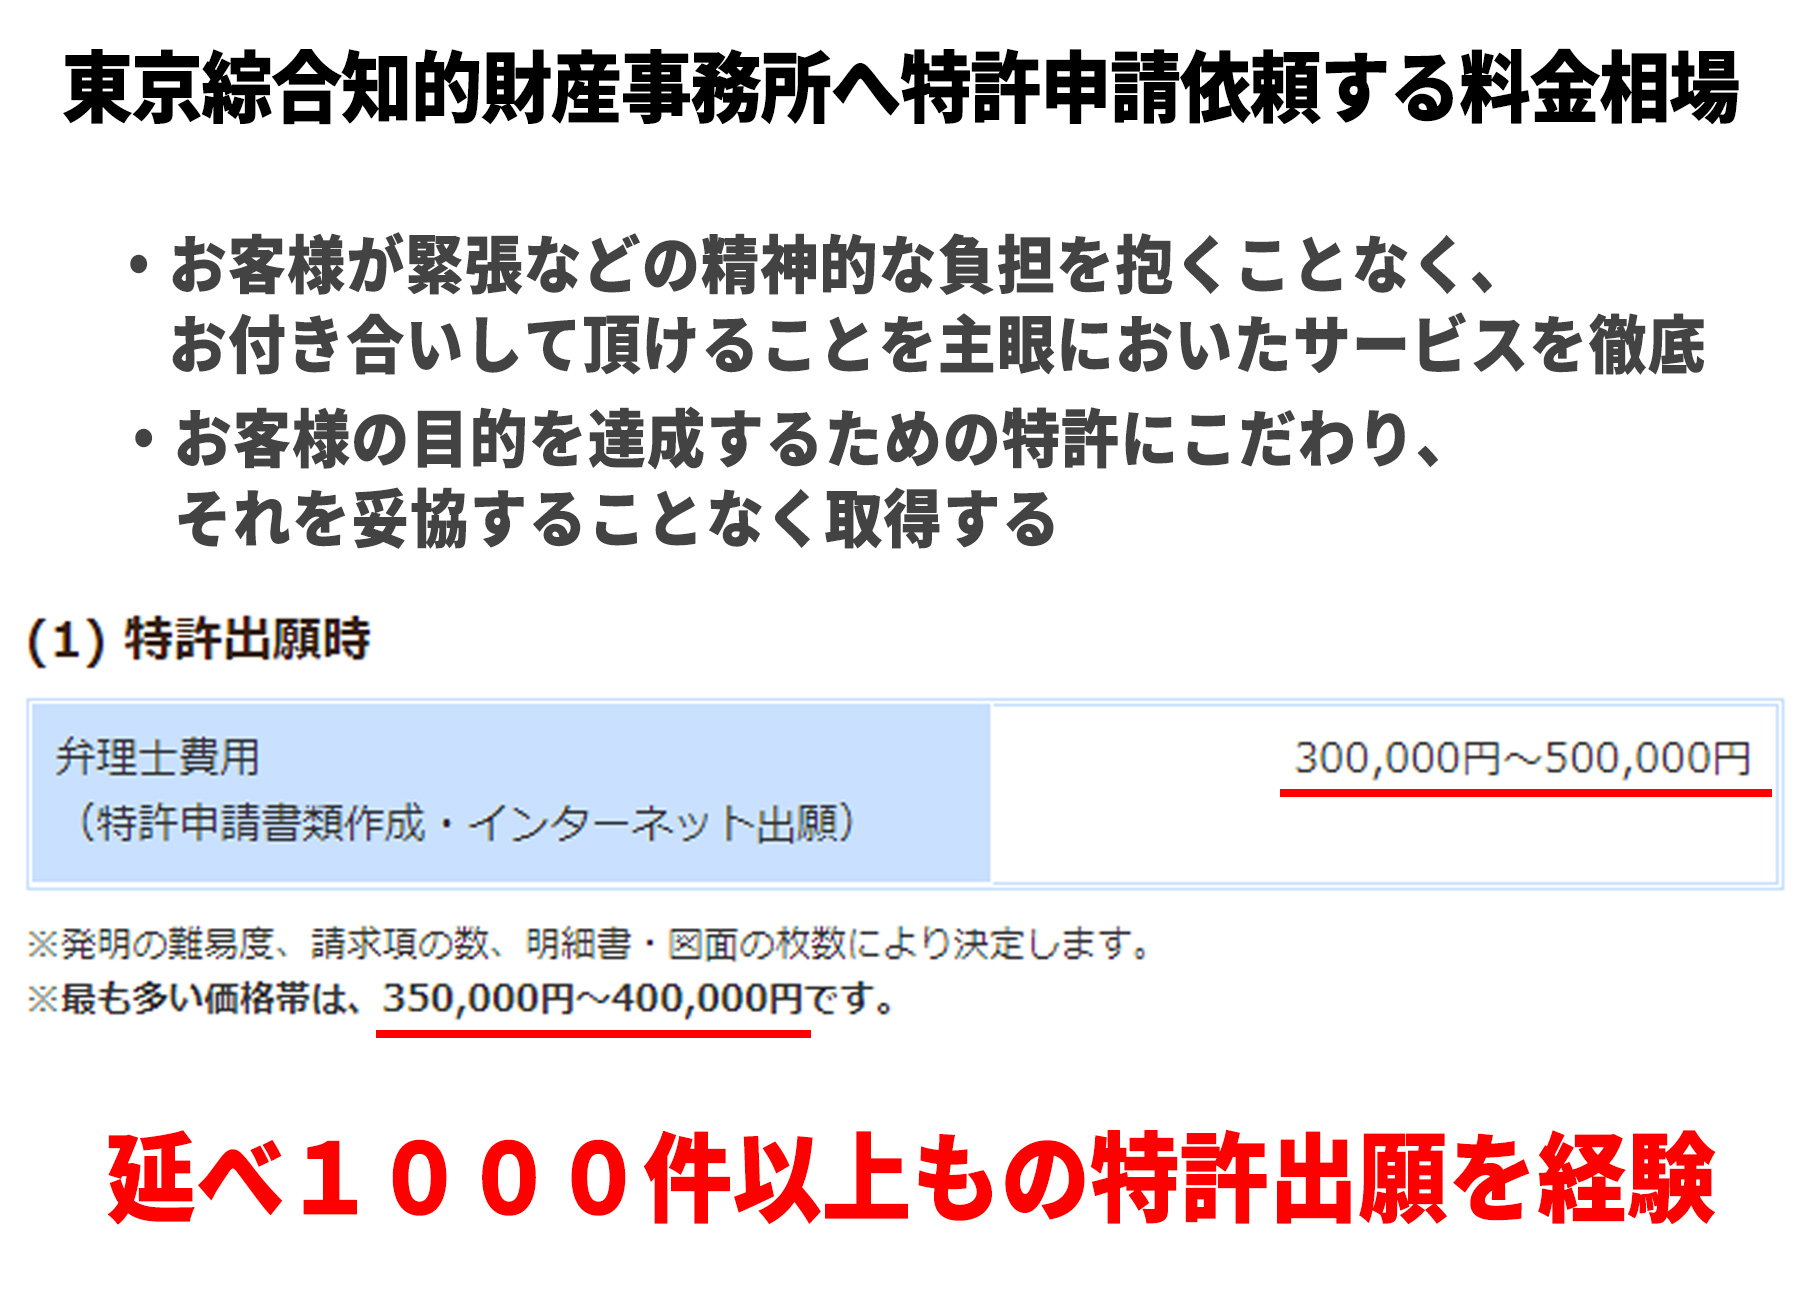 東京綜合知的財産事務所へ特許申請依頼する料金相場